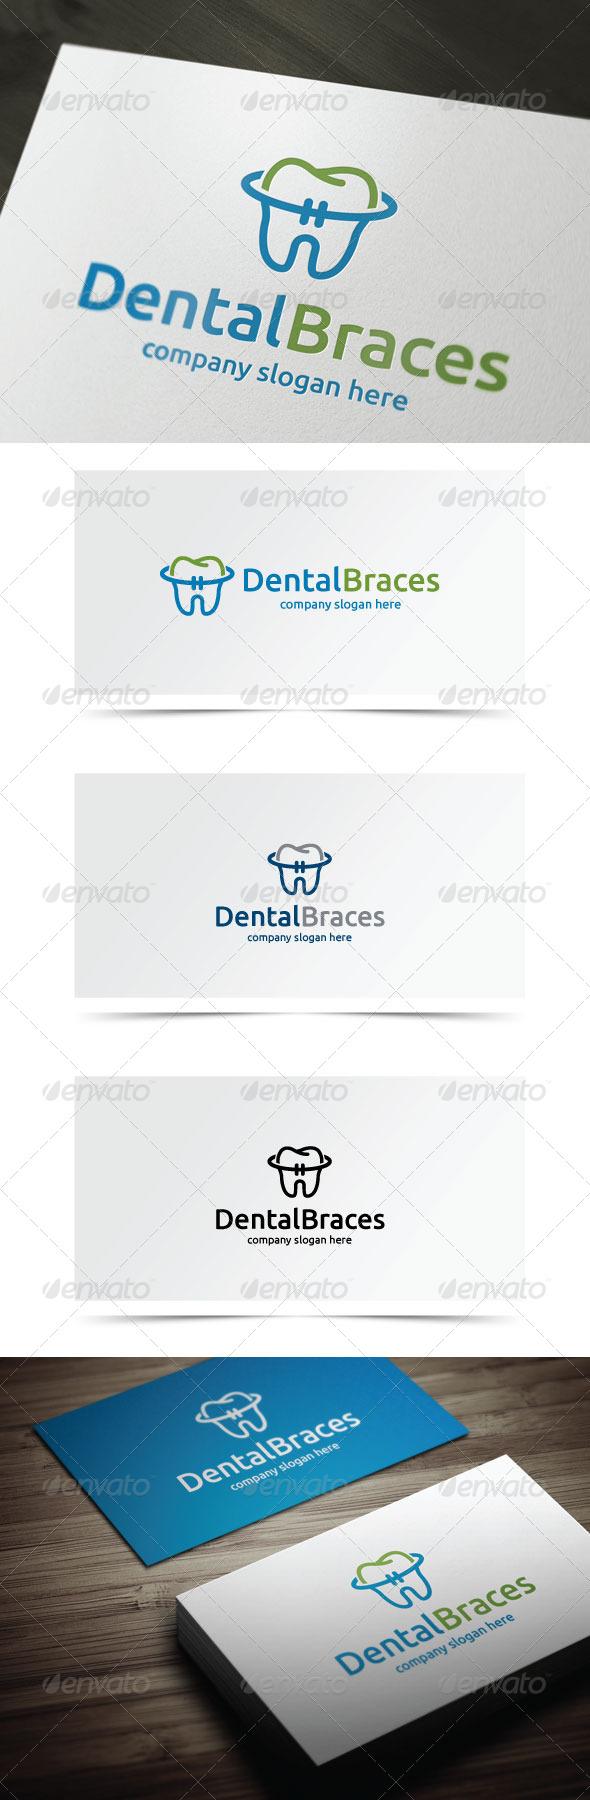 GraphicRiver Dental Braces 7827015